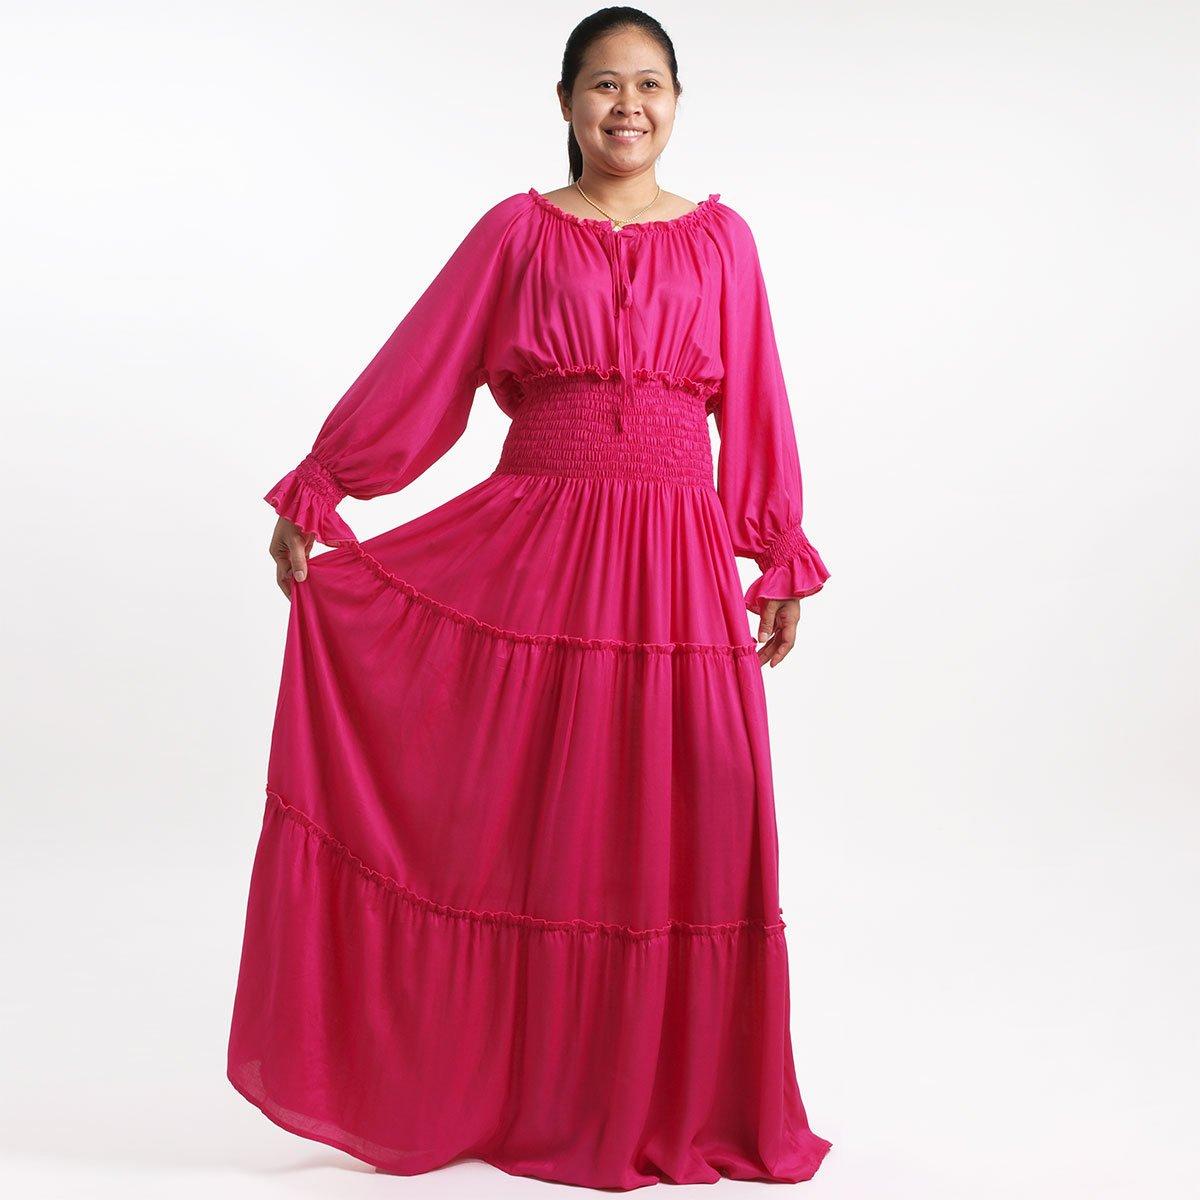 Hot Pink Plus Size Dresses - Ficts